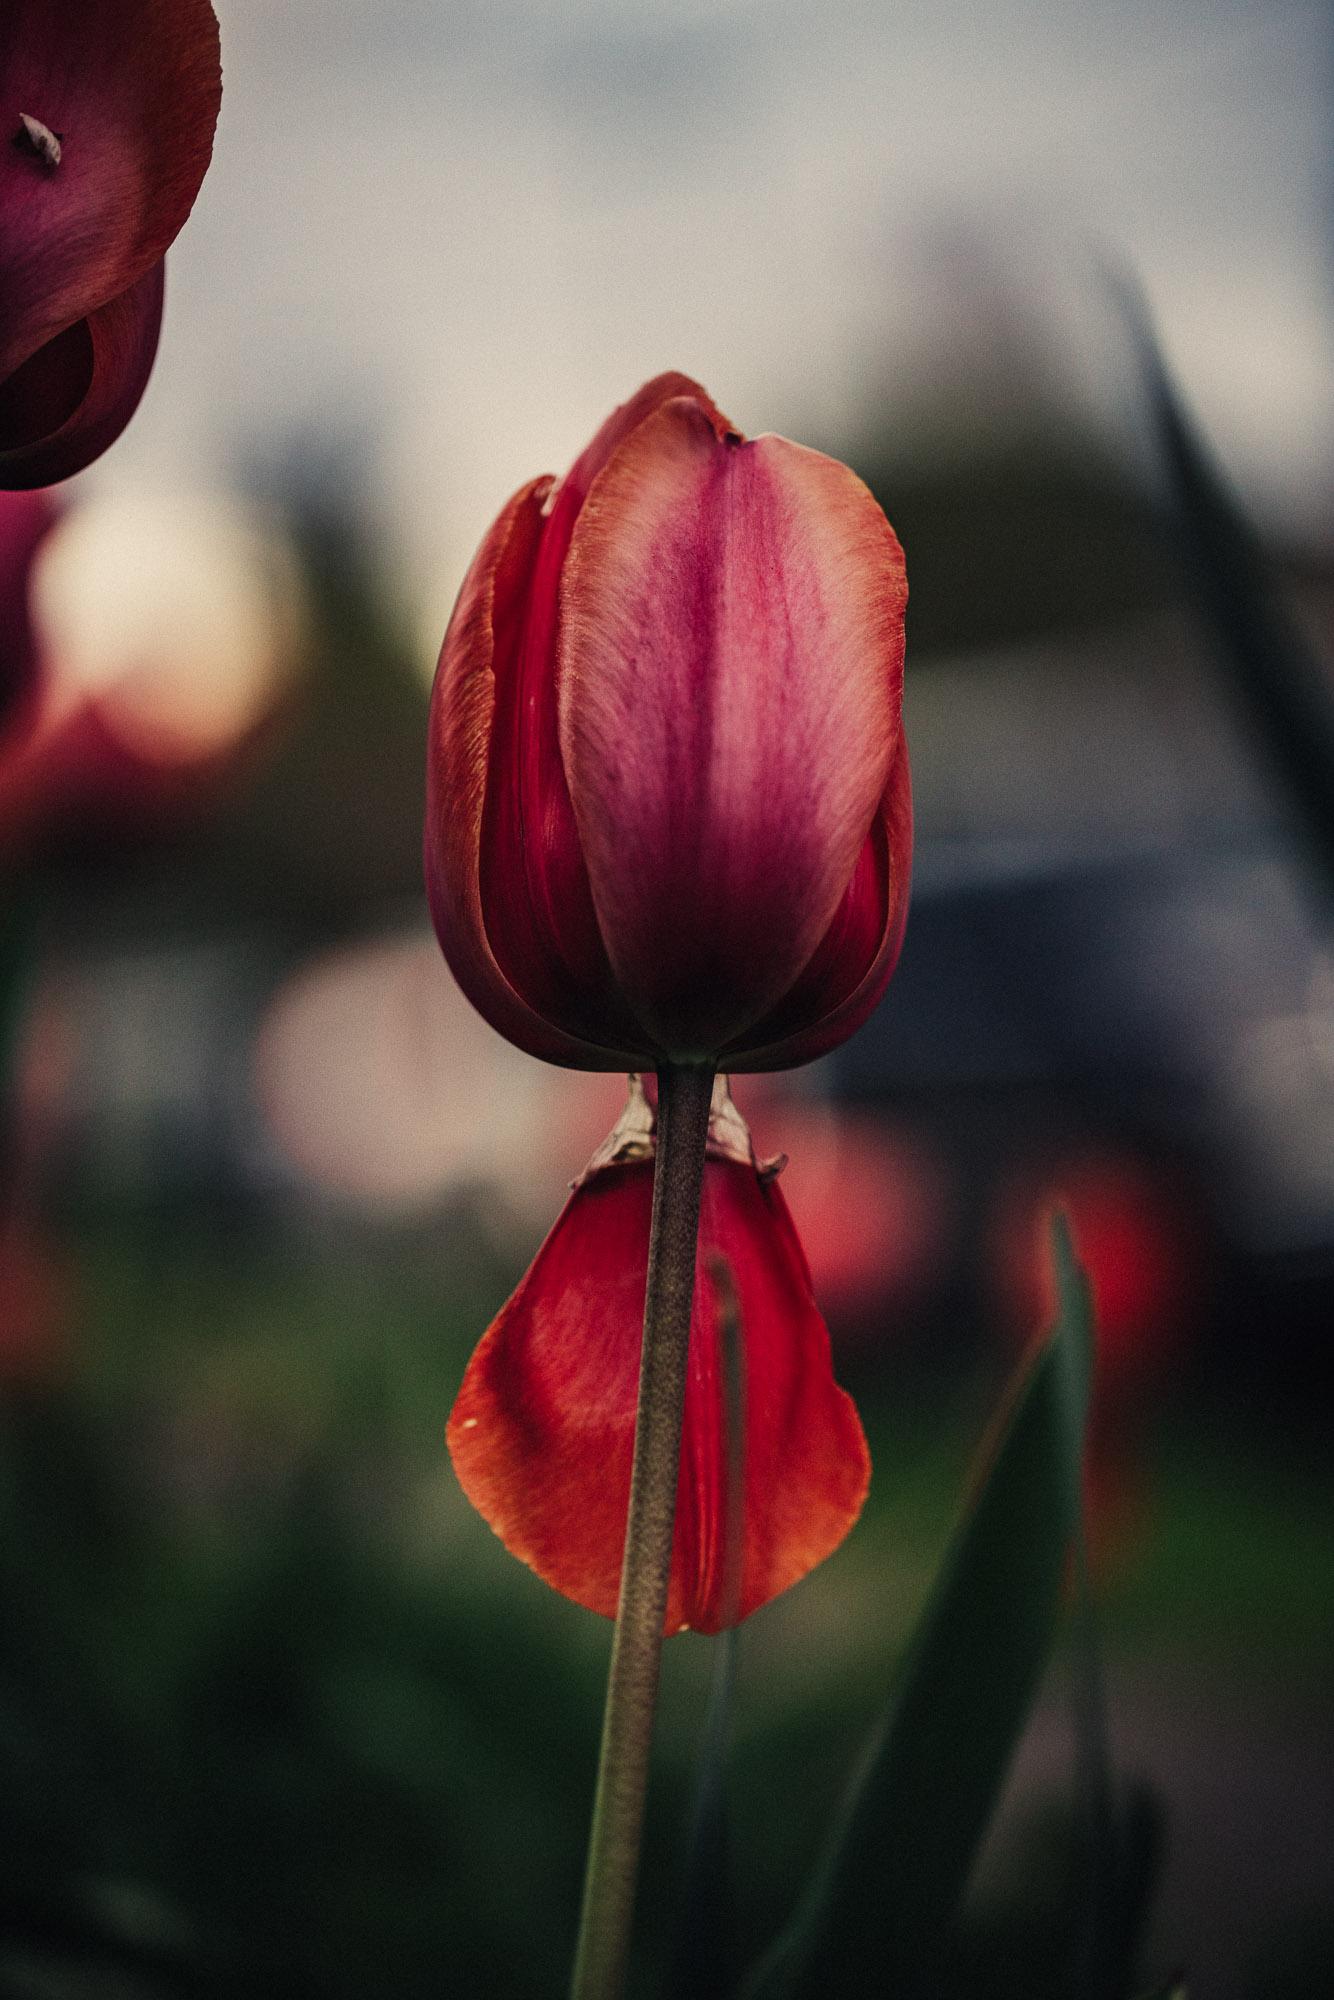 20180410_tulips_0038.jpg